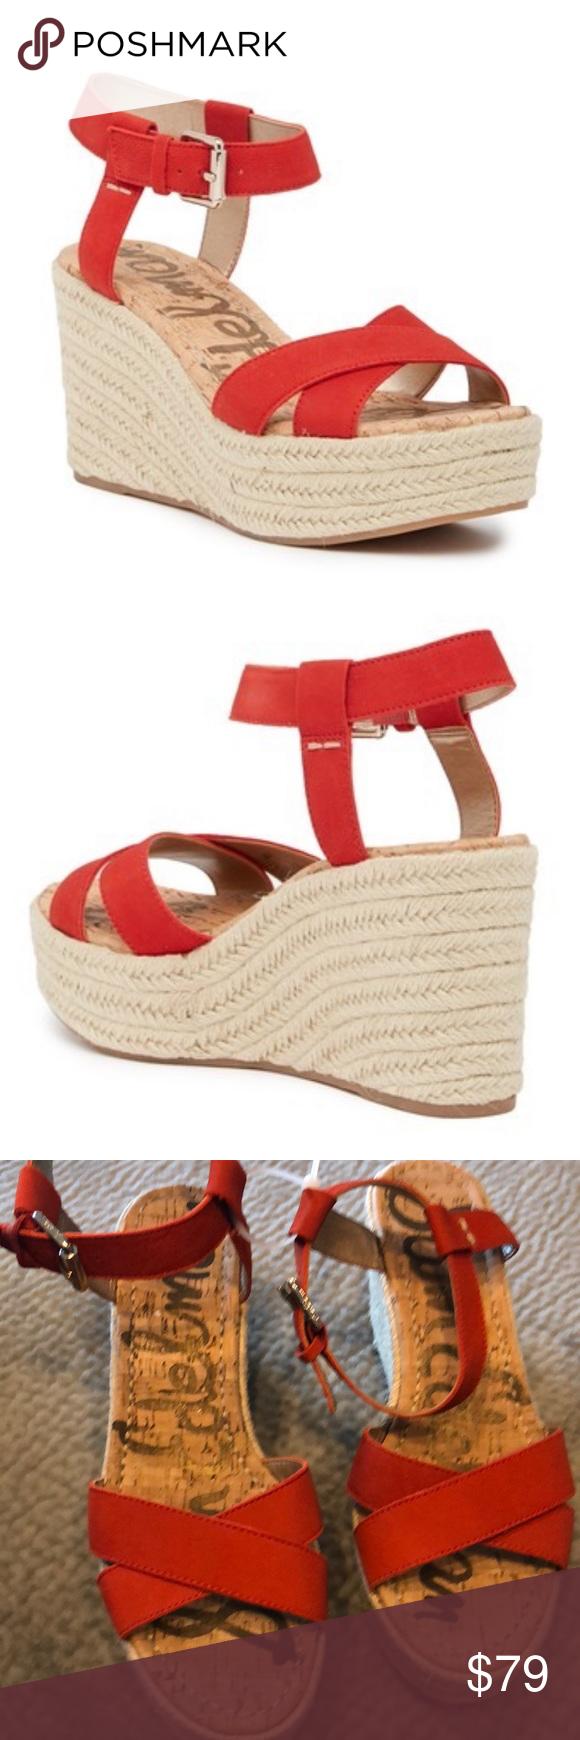 48bf8882ac3 Sam Edelman Shoes | San Edelman Destin Espadrille Wedge Sandal Nwot ...